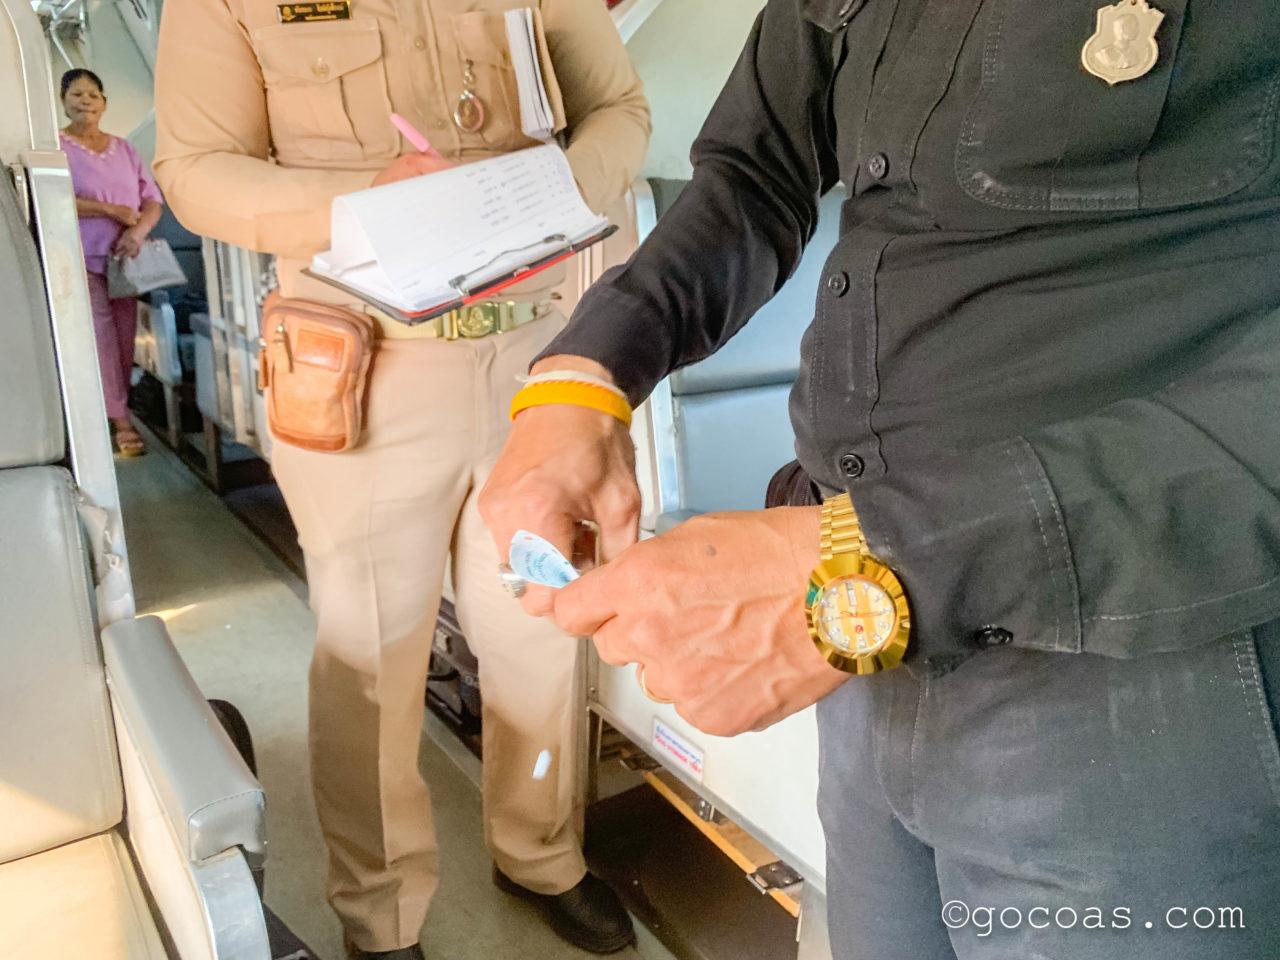 Hua Lamphong駅で乗った電車内で切符の確認に来る職員